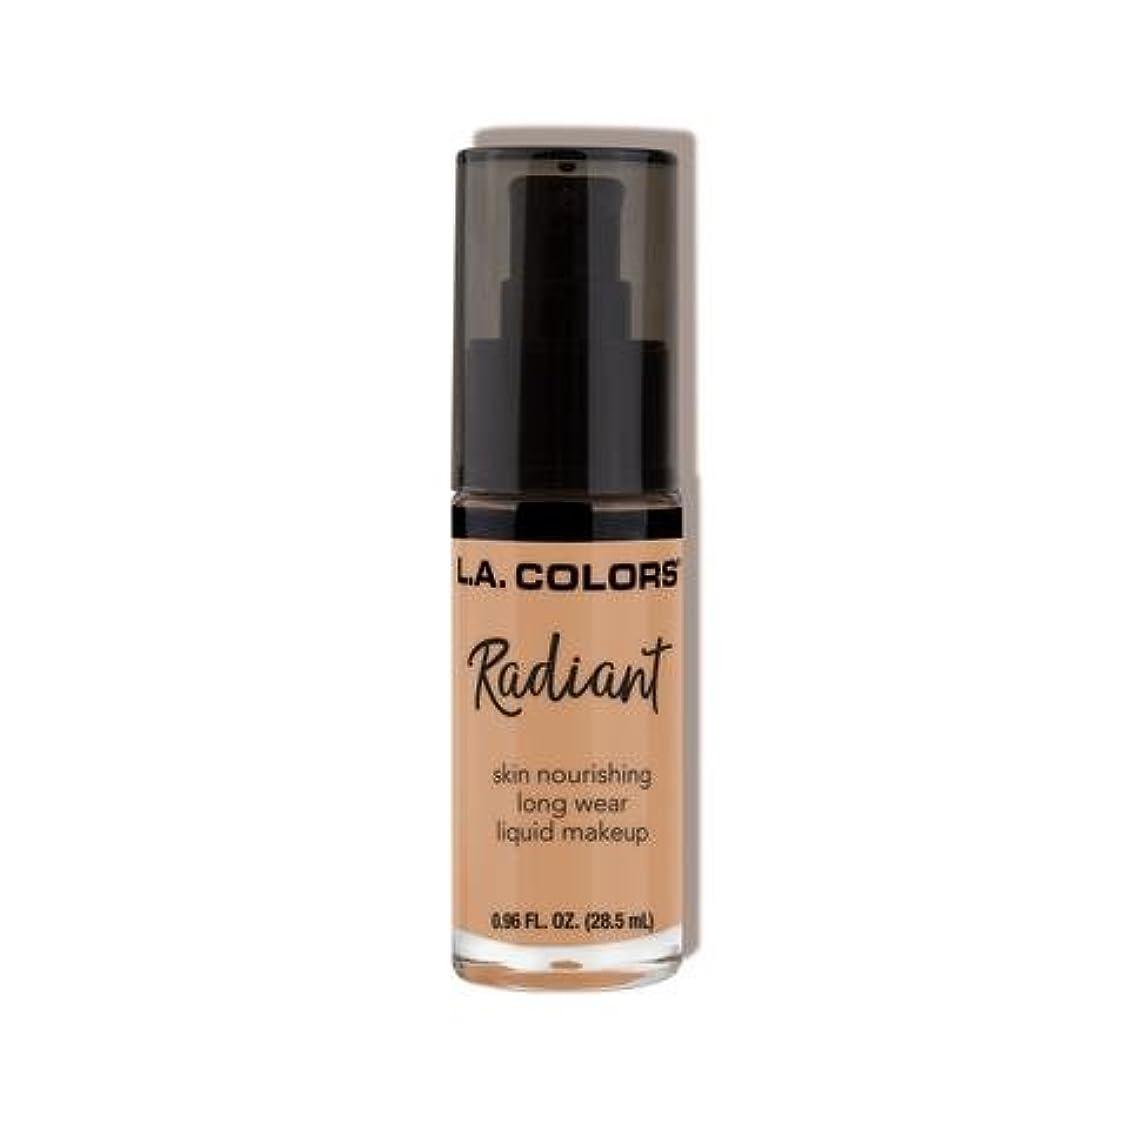 評価可能家禽簡単に(3 Pack) L.A. COLORS Radiant Liquid Makeup - Light Tan (並行輸入品)